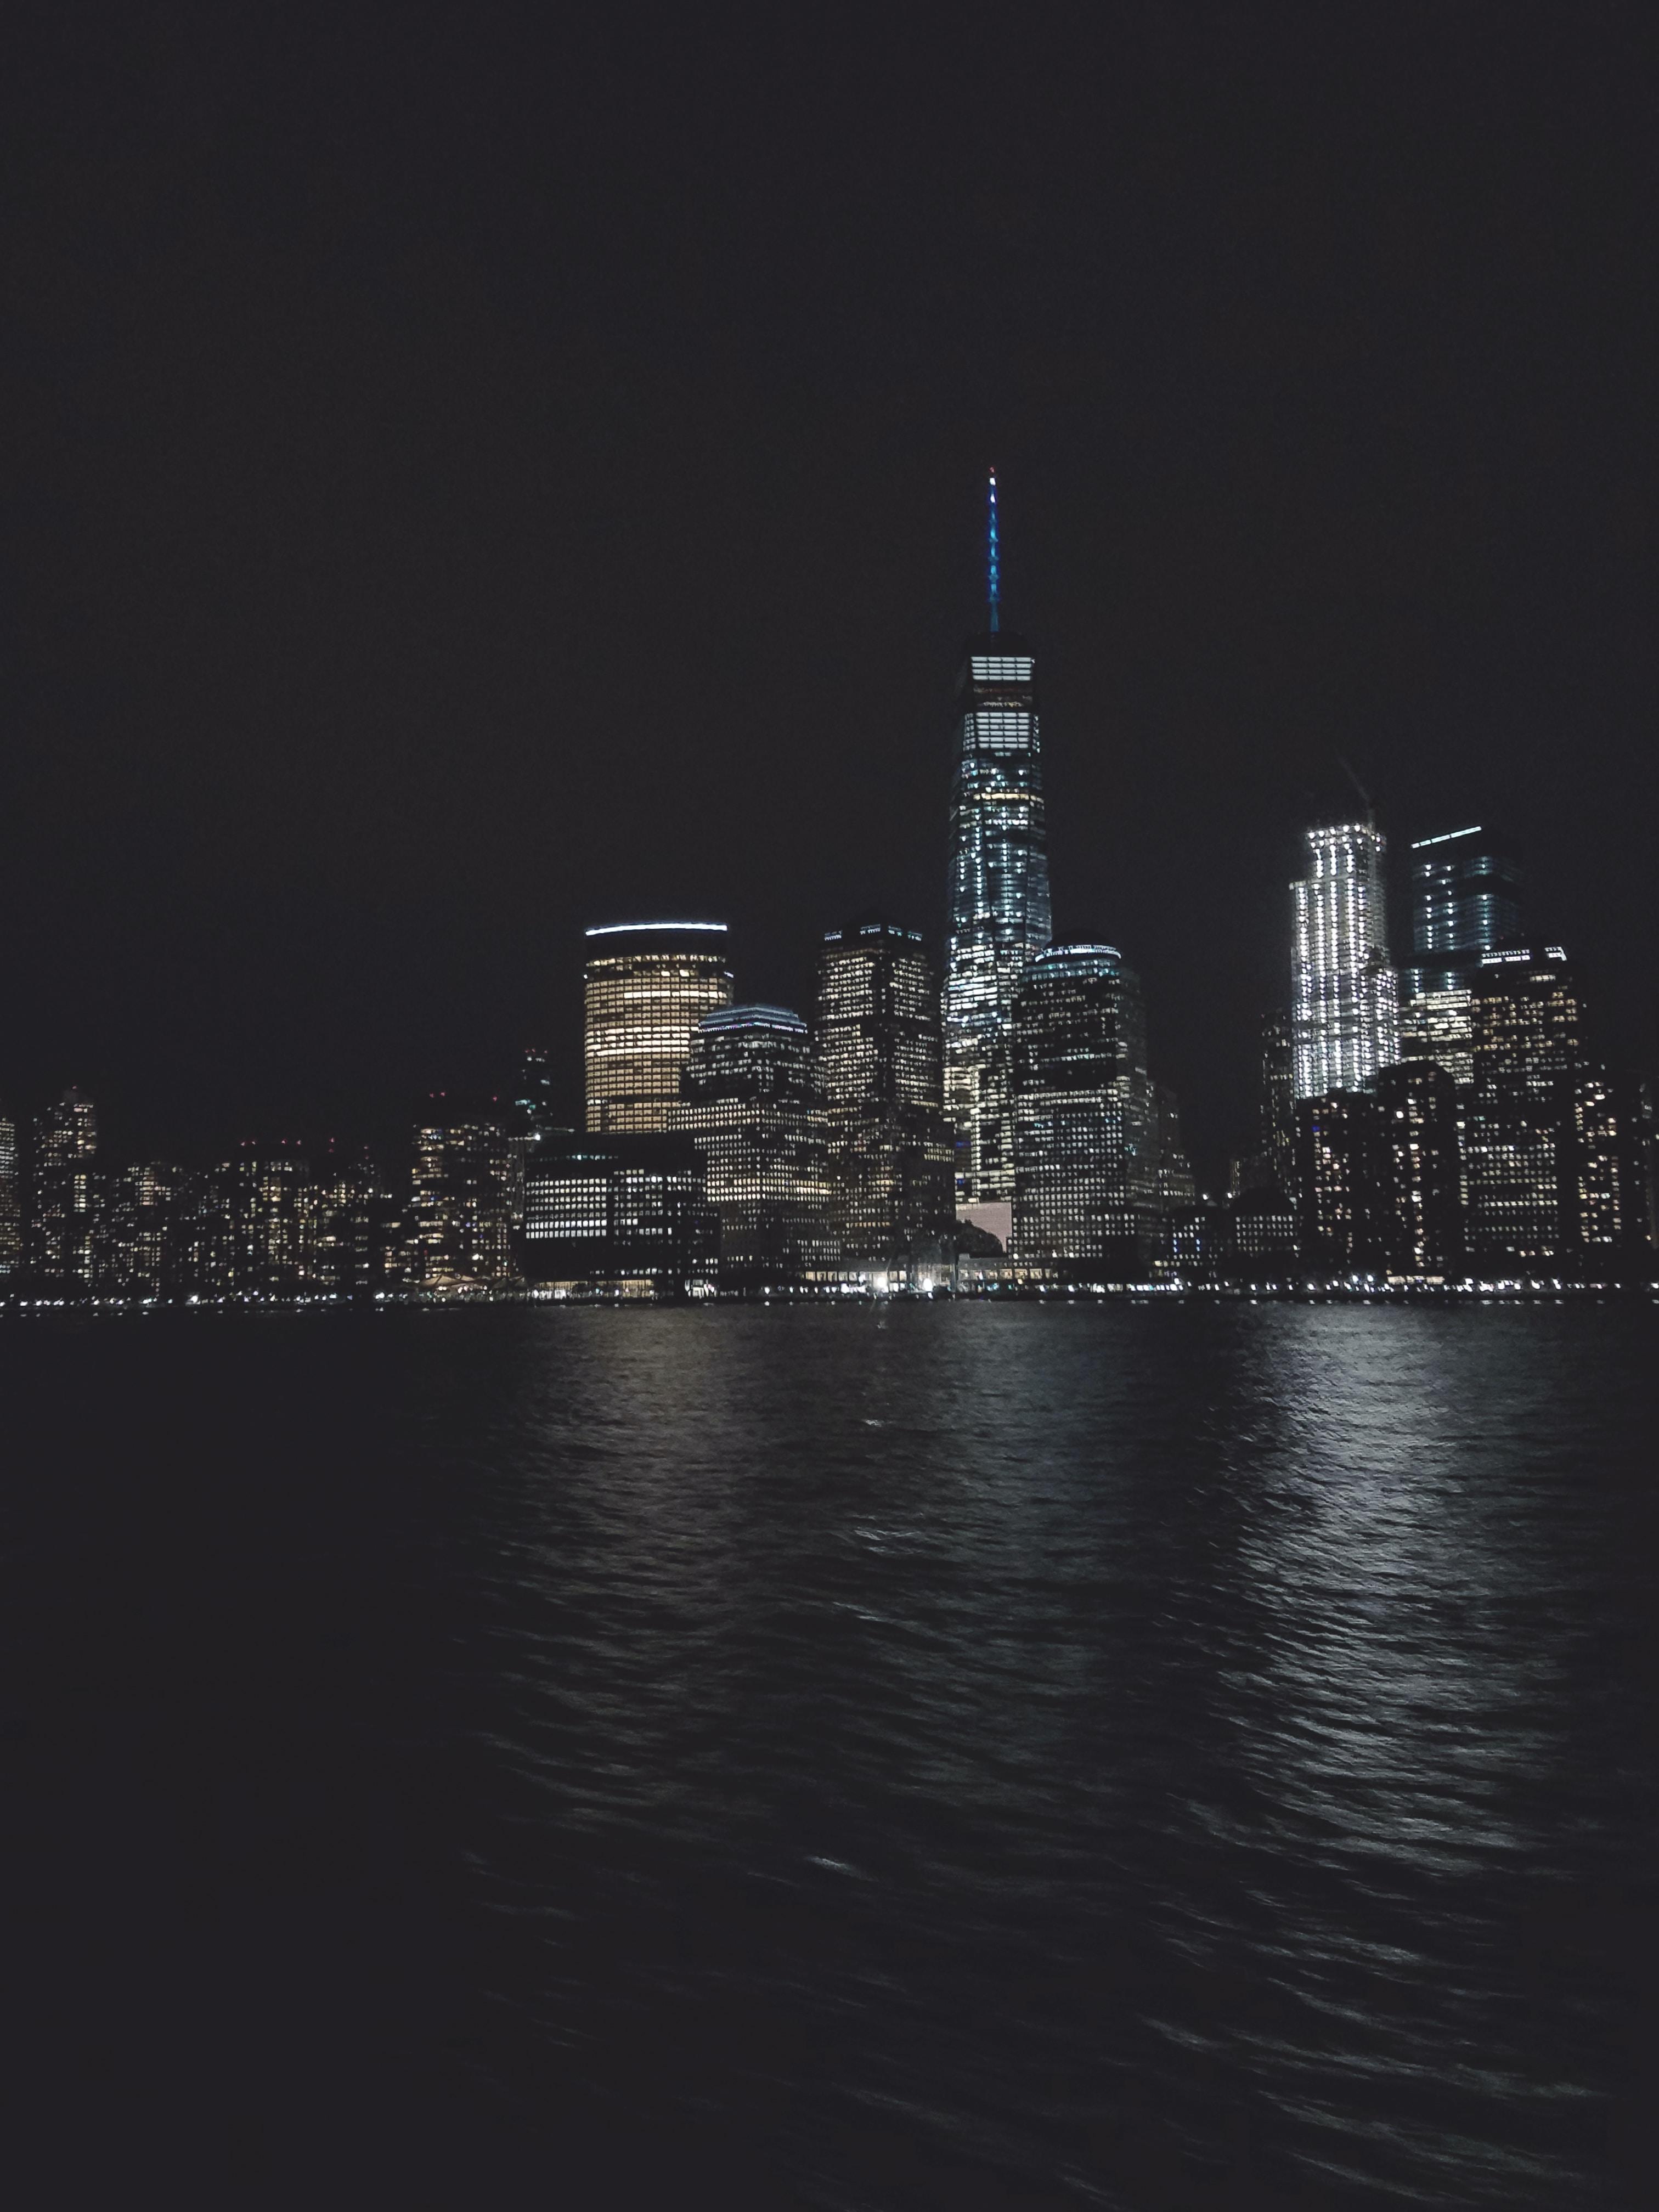 photo of concrete high rise building